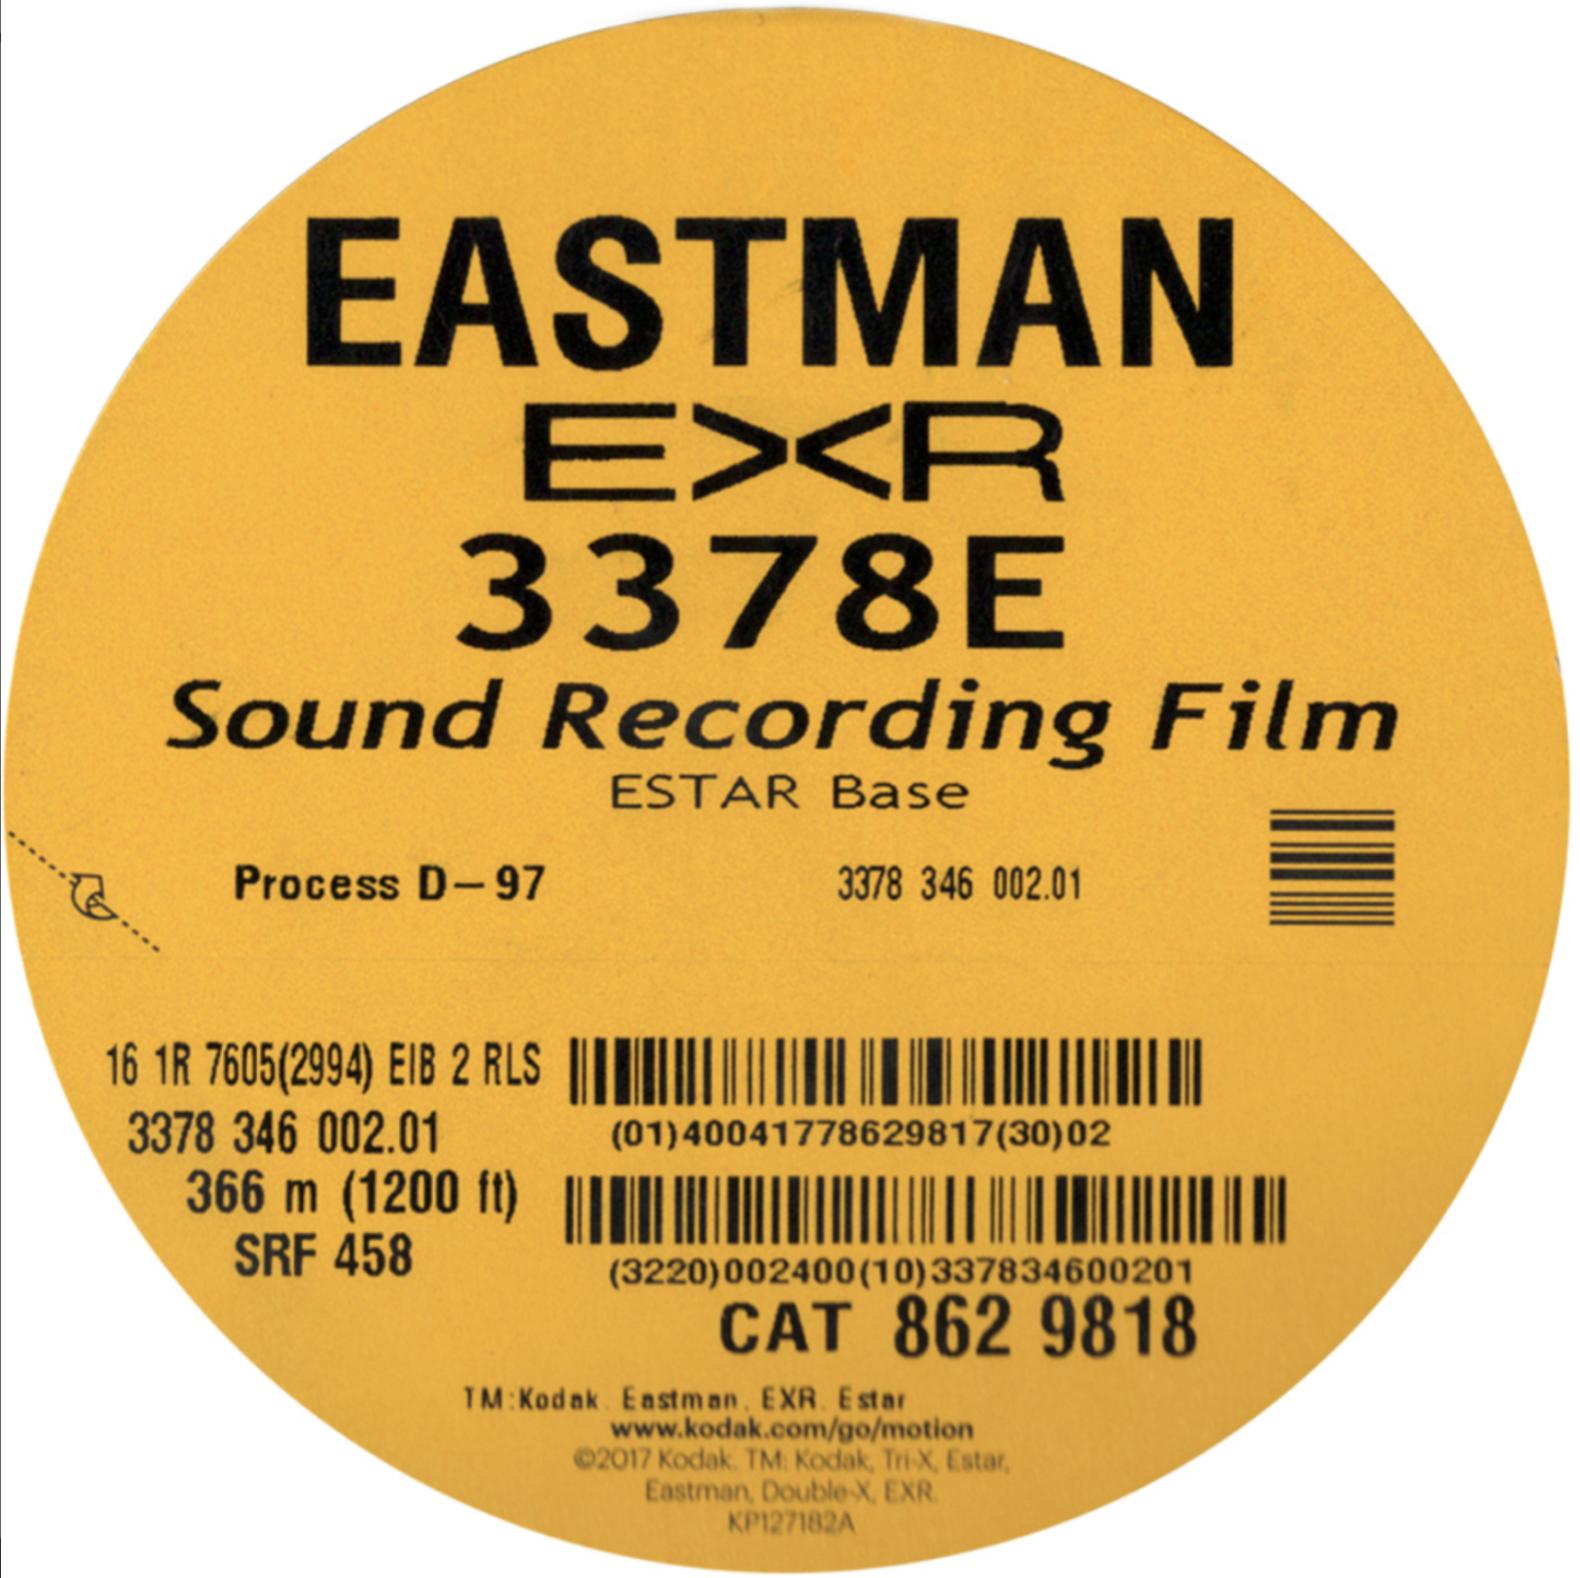 EASTMAN EXR 3378E B/W SOUND RECORDING FILM   B/W PRINT 16MM $12.00 - 100ft DAYLIGHT SPOOL or $00.15 a foot ANY LENGTH